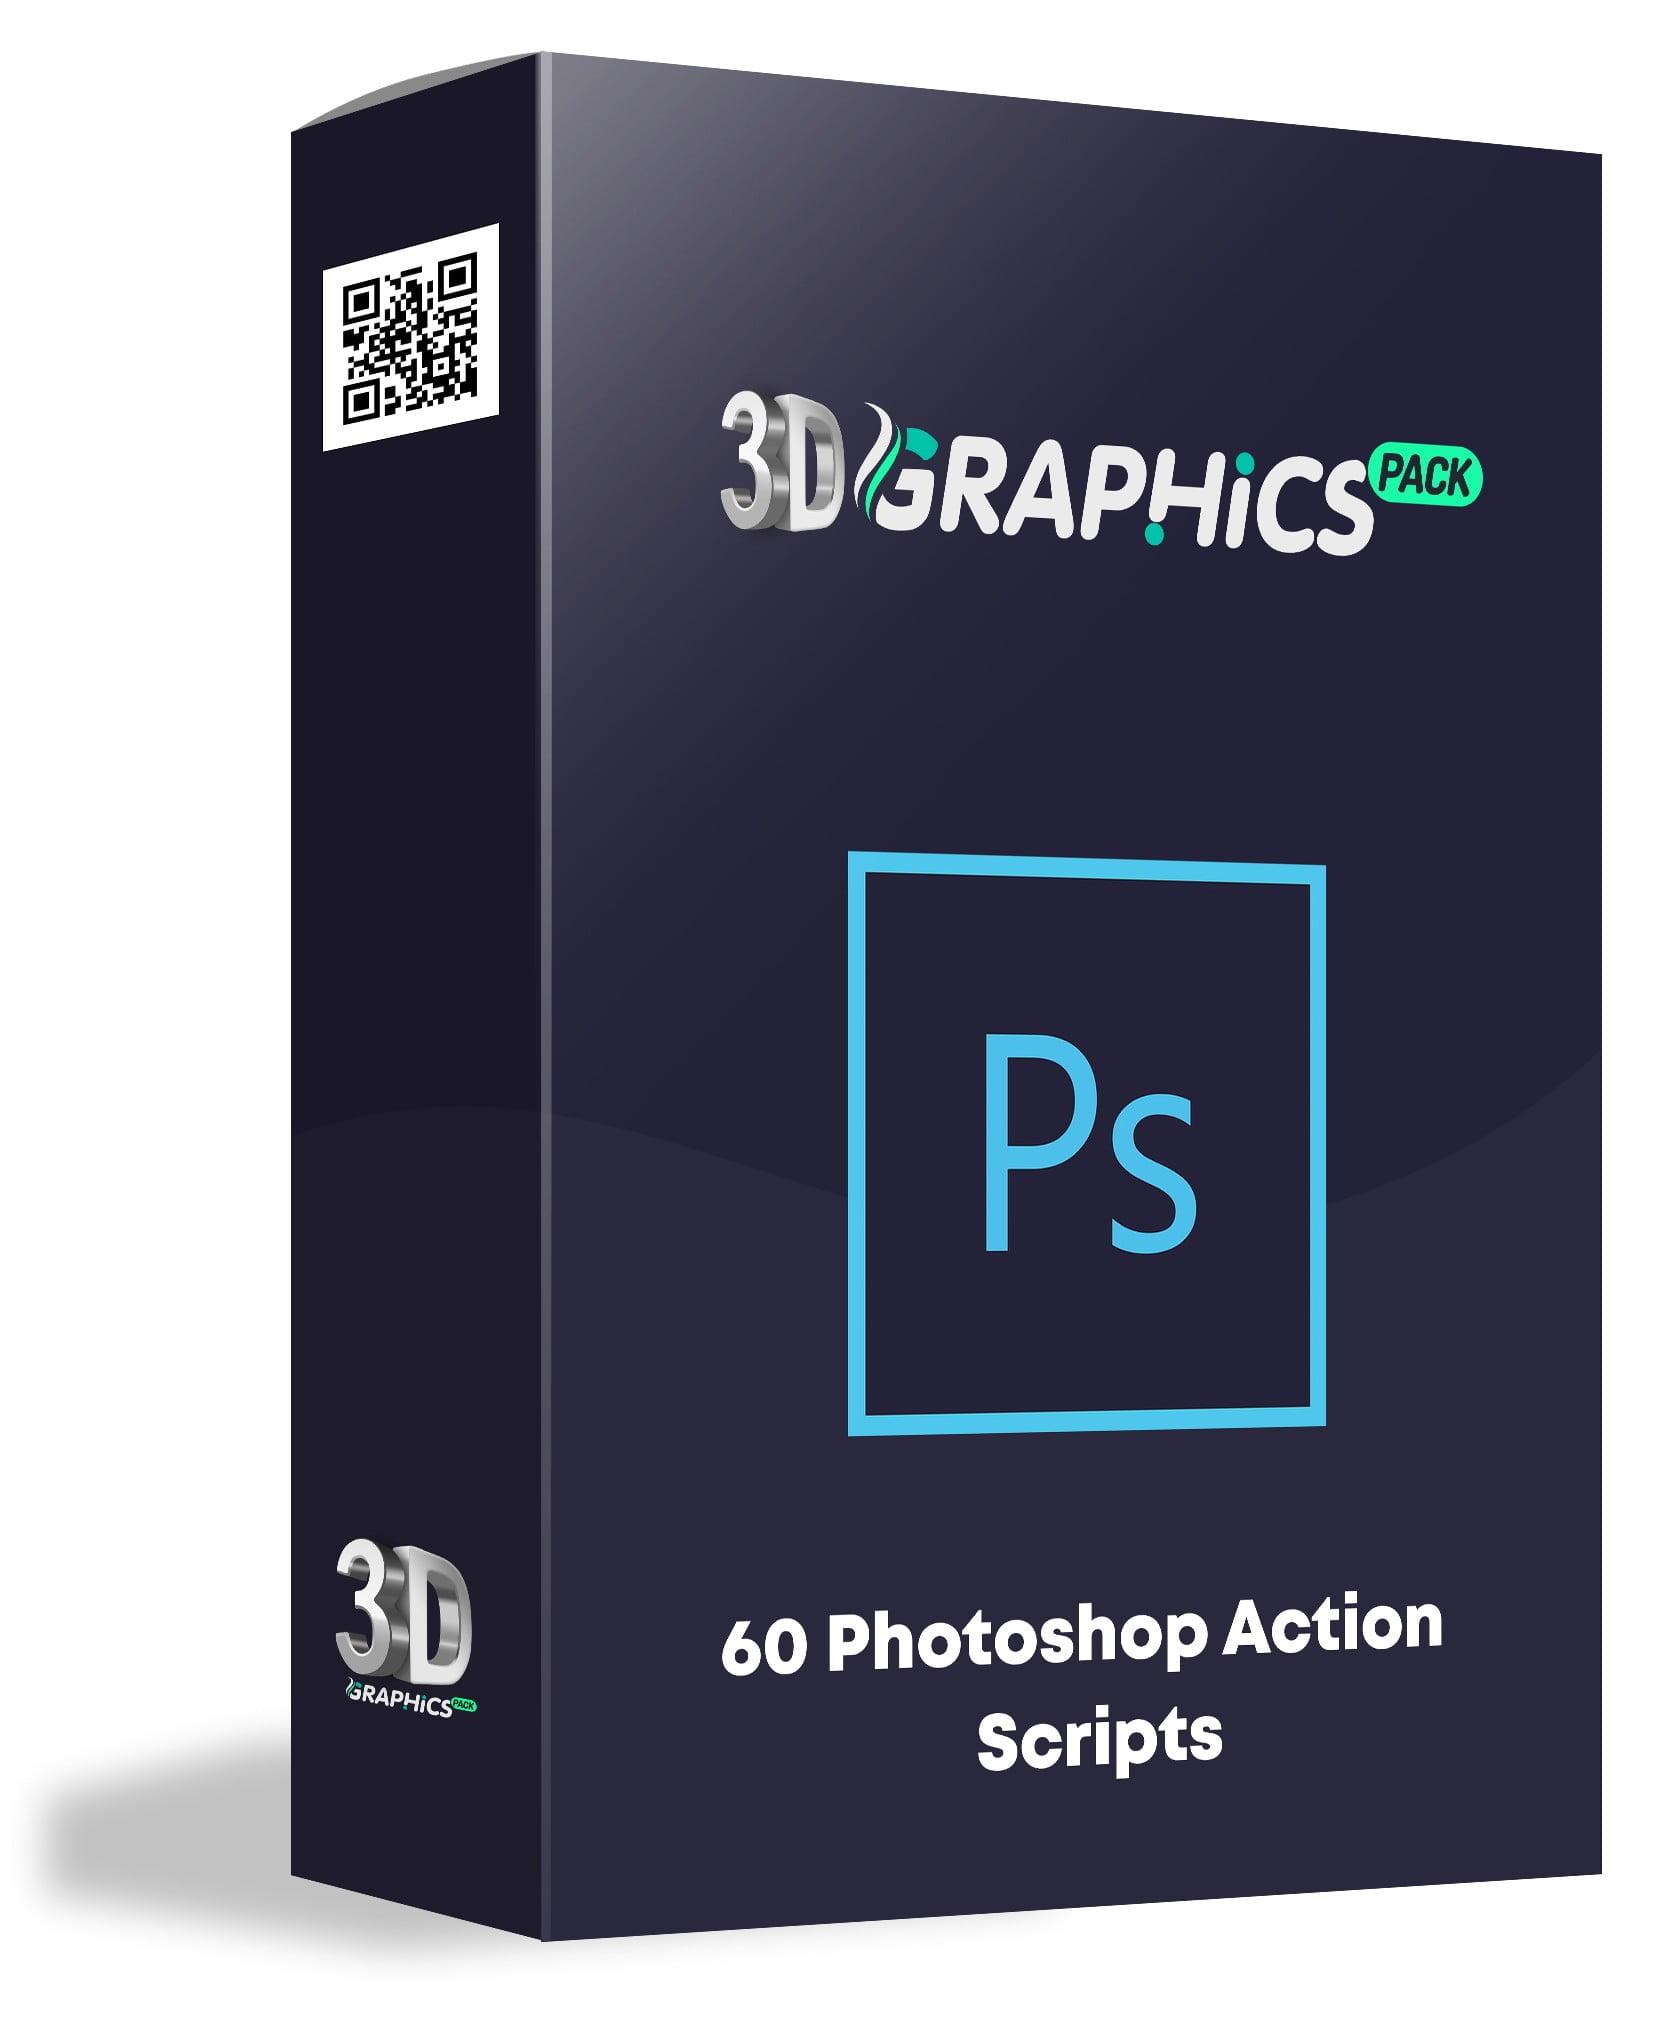 3D-Graphics-PLR-bonus-1